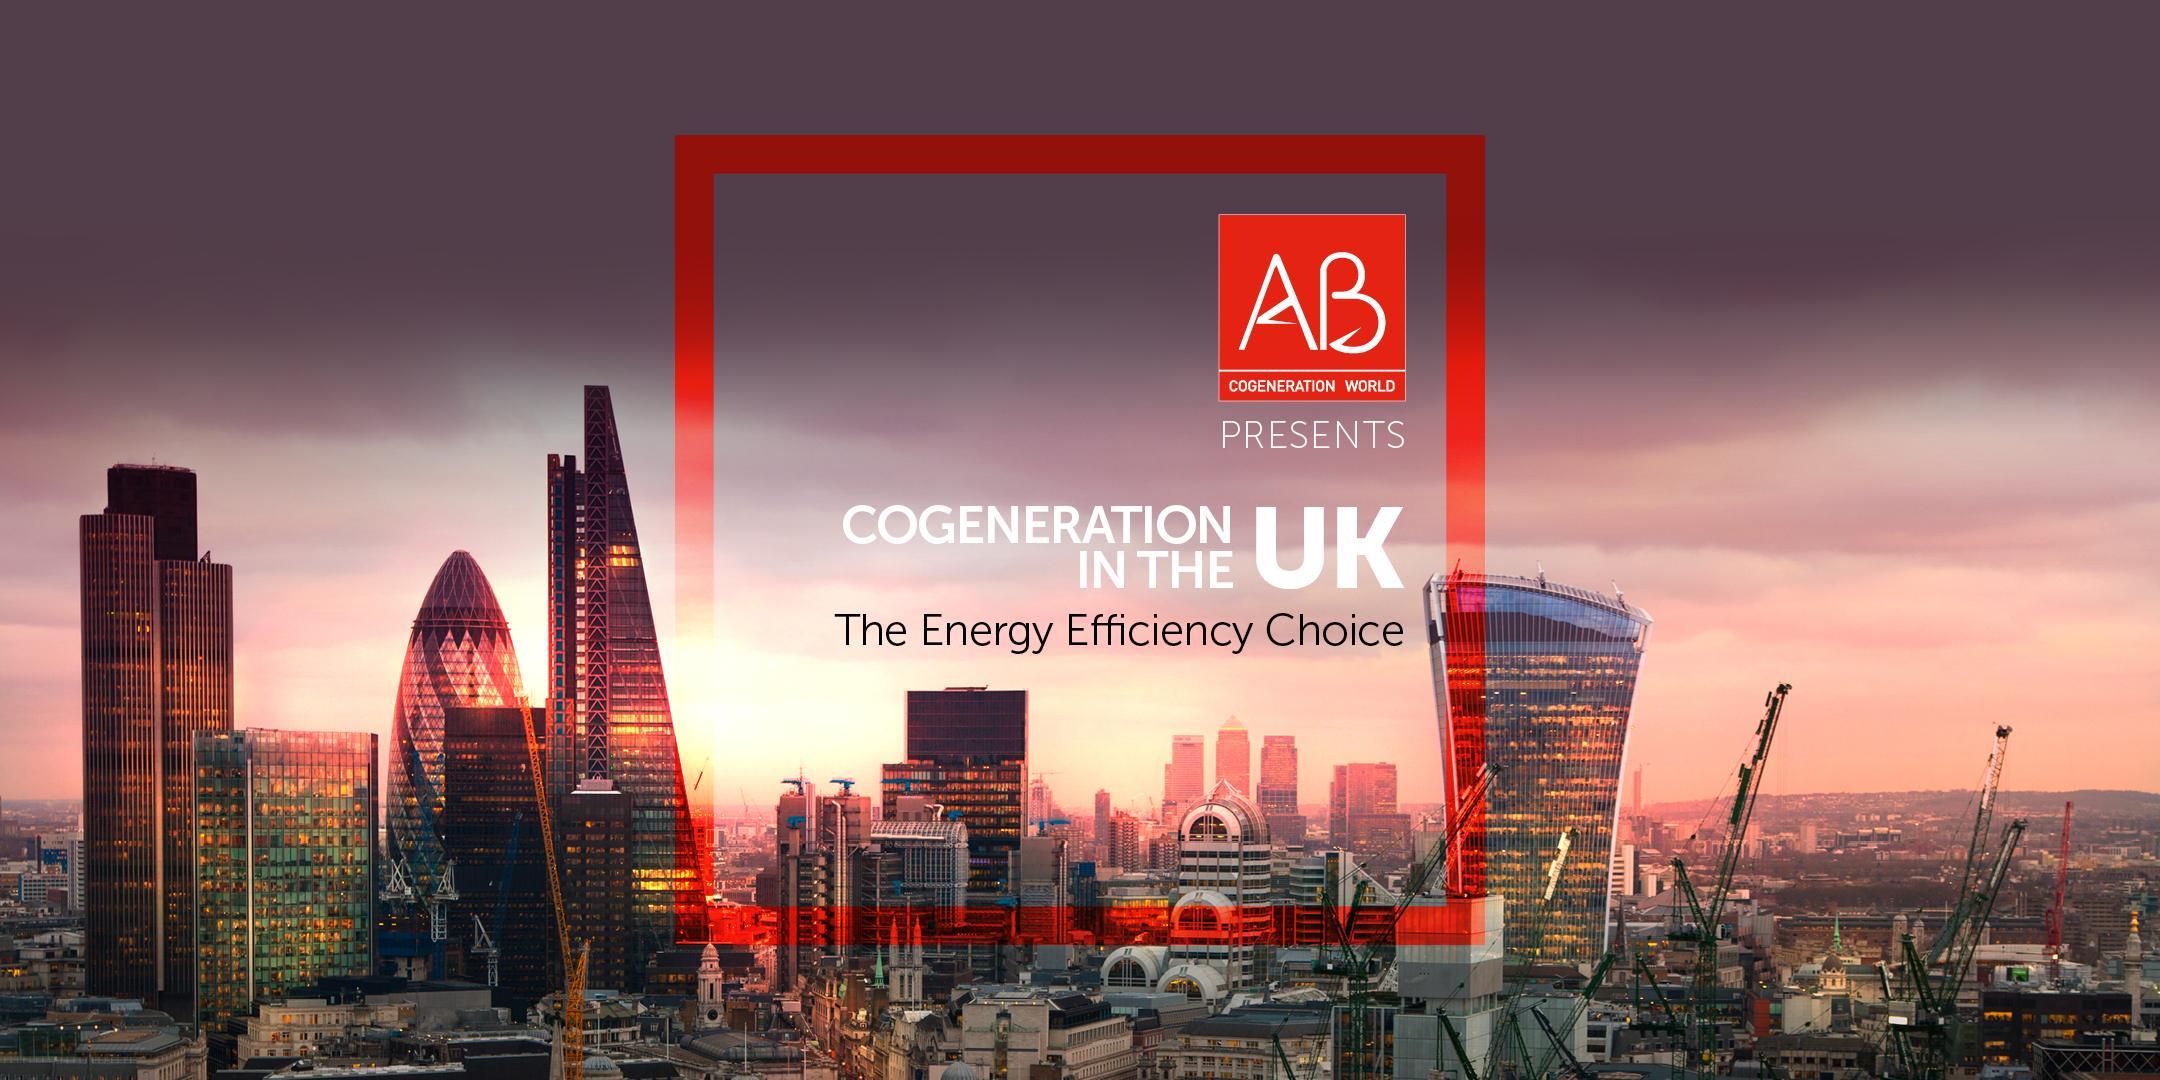 Cogeneration in the UK